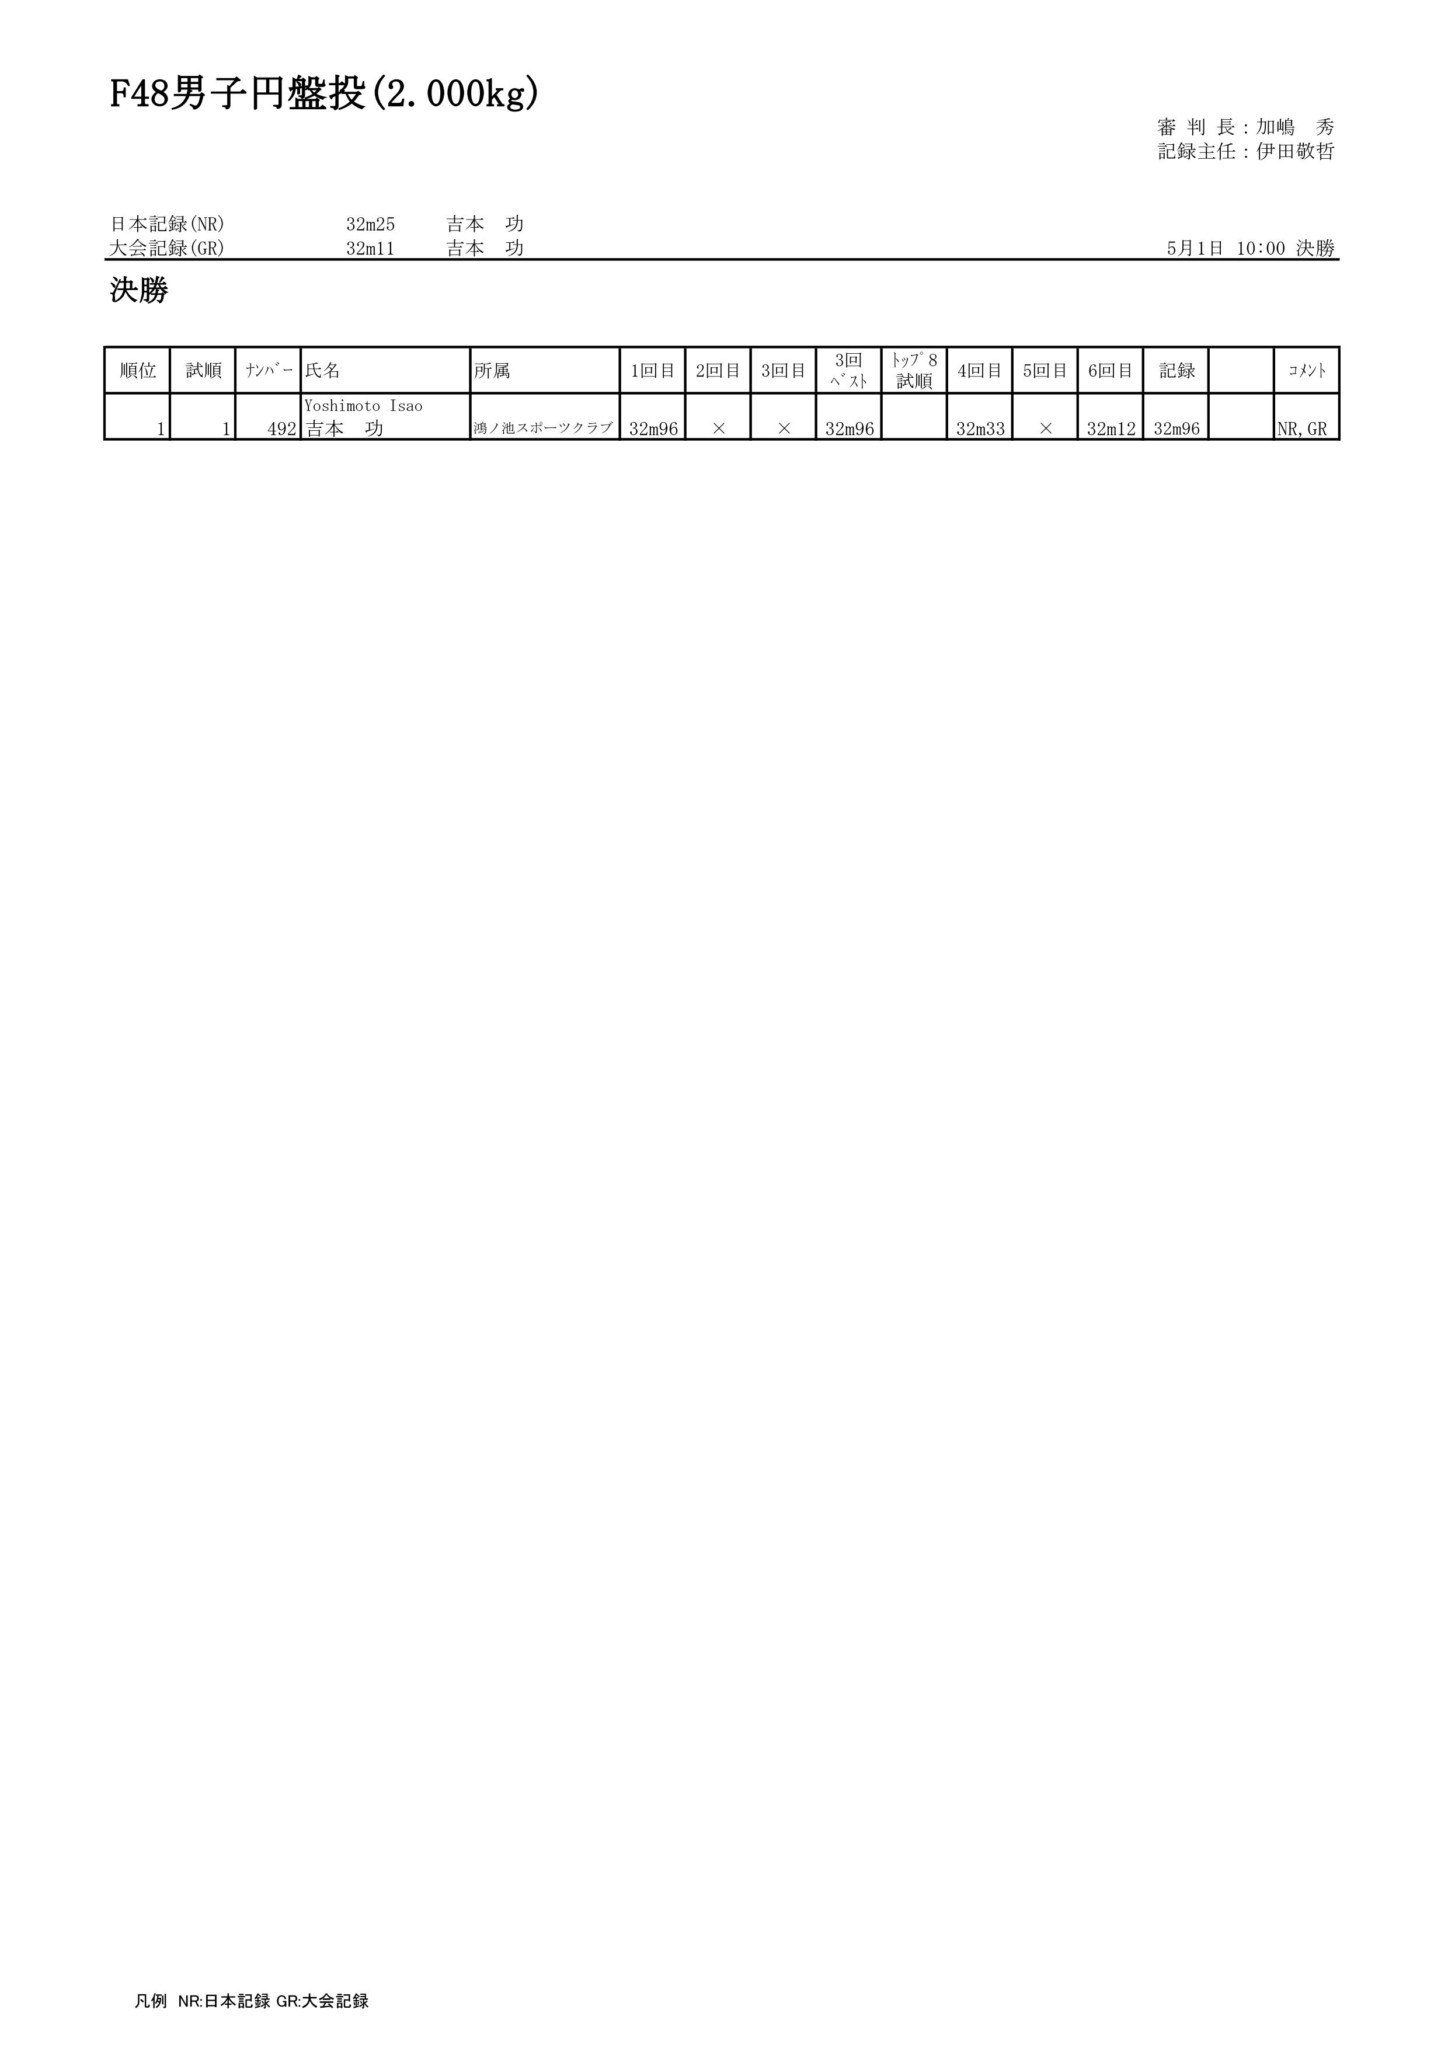 11F48男子円盤投(2.000kg)_01